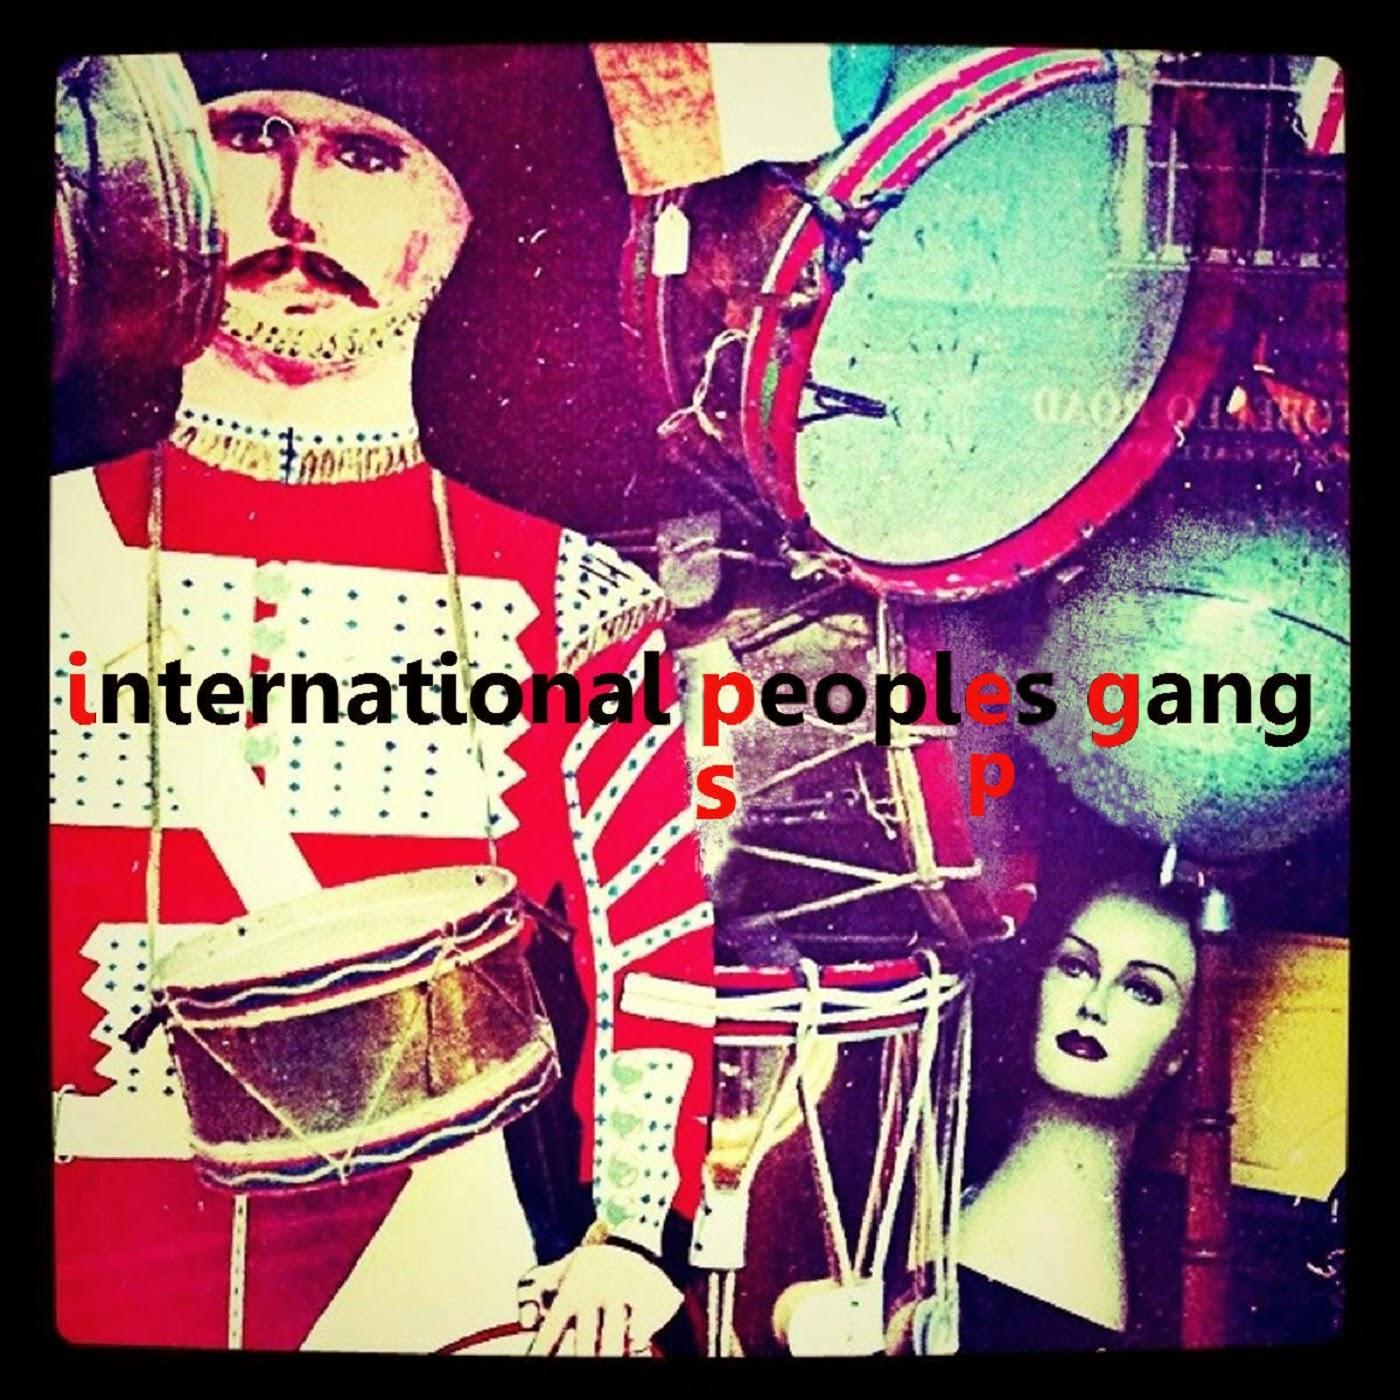 discosafari - INTERNATIONAL PEOPLES GANG - Ps